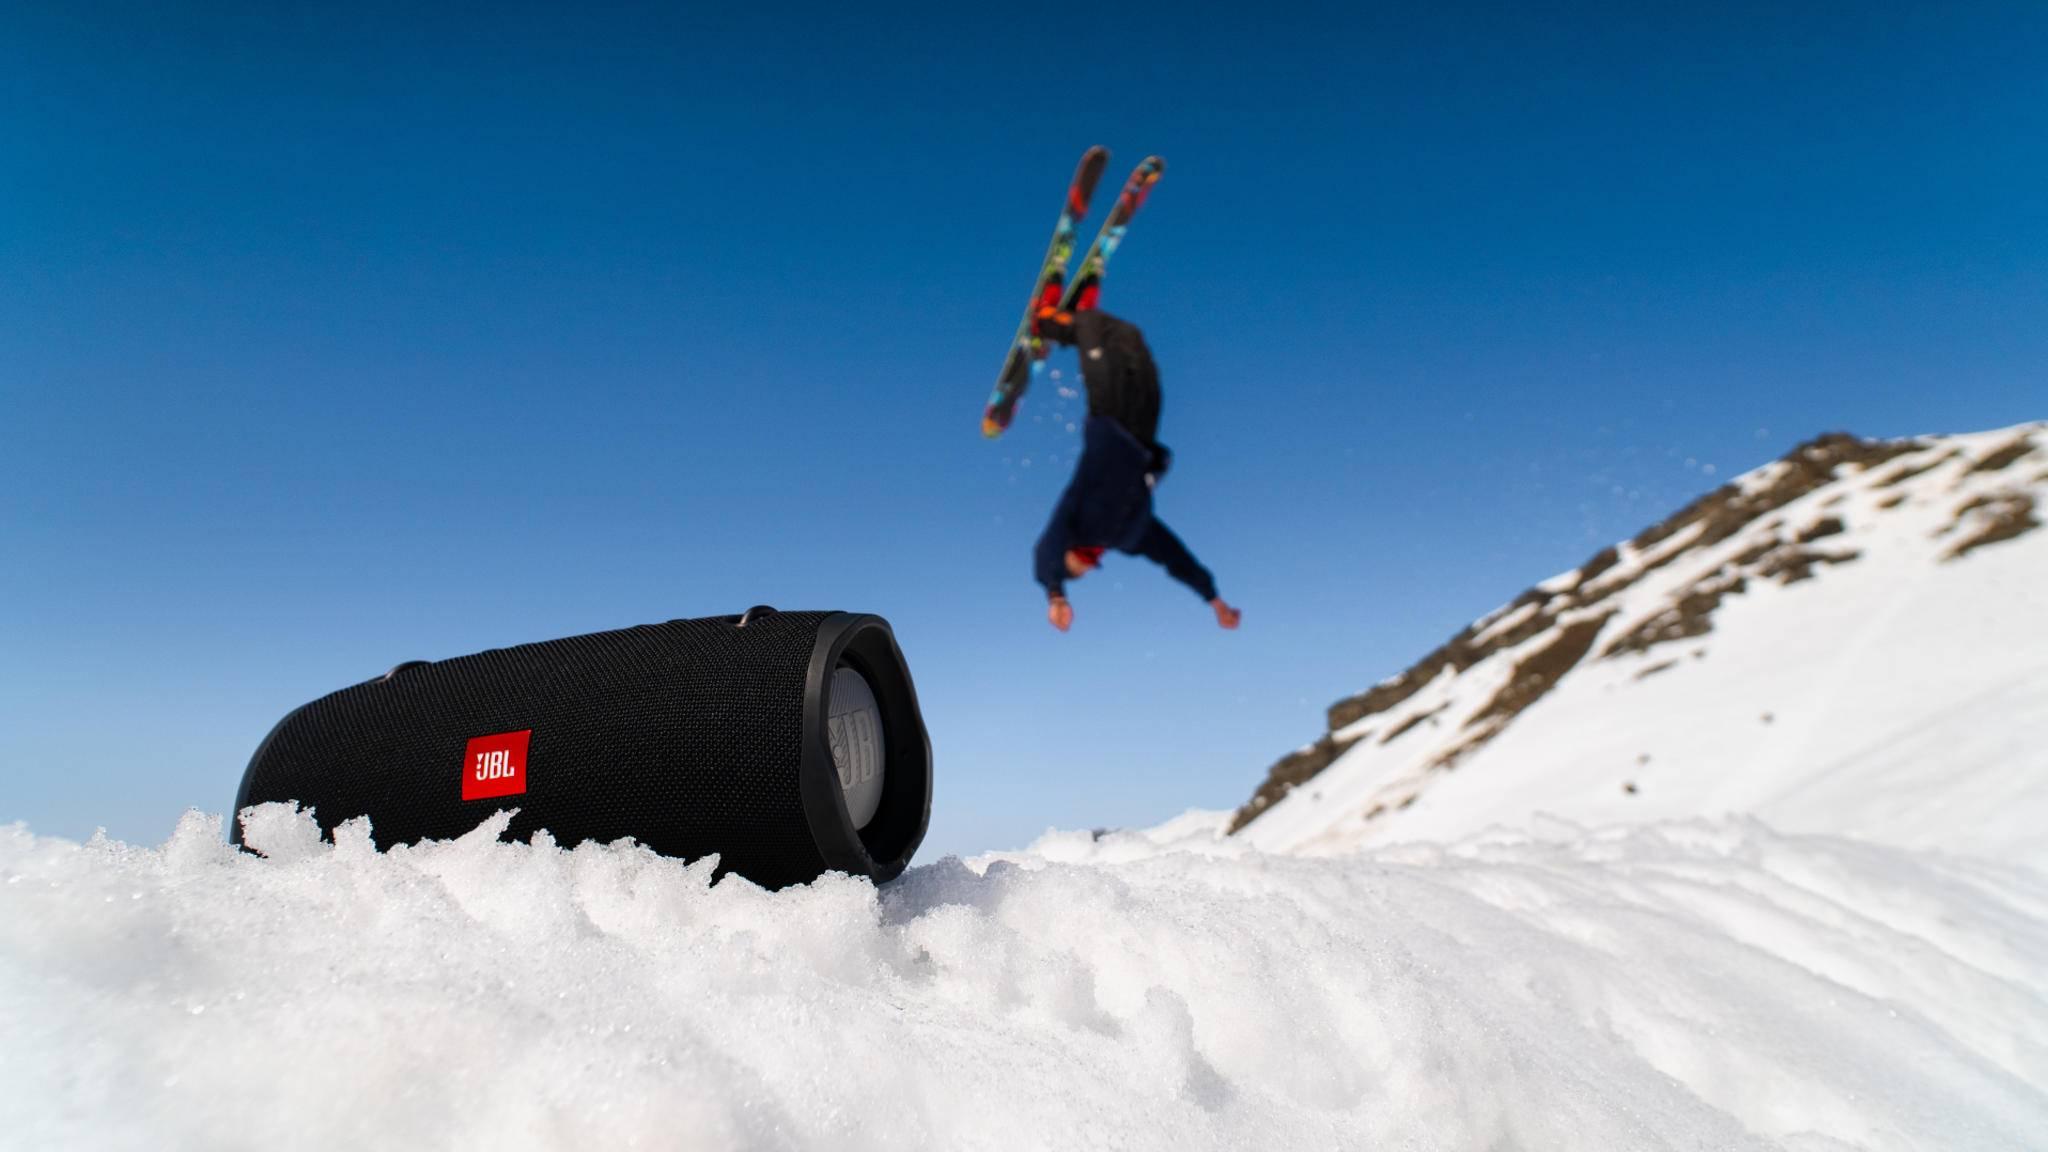 jbl-xtreme-2-schnee-skifahrer-salto